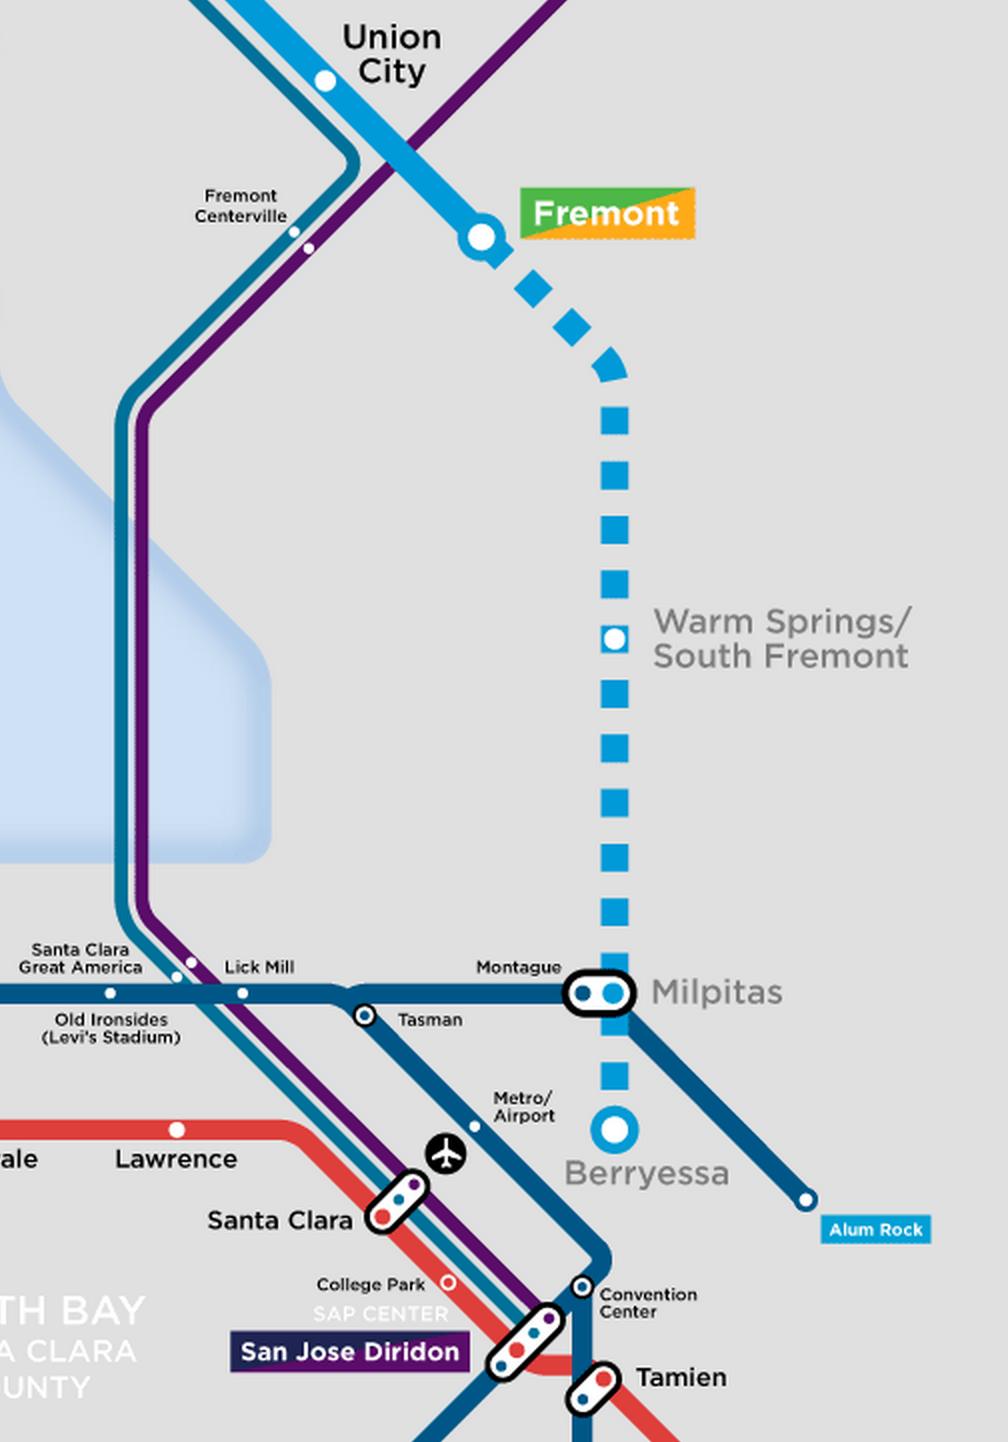 My favorite regional transit maps